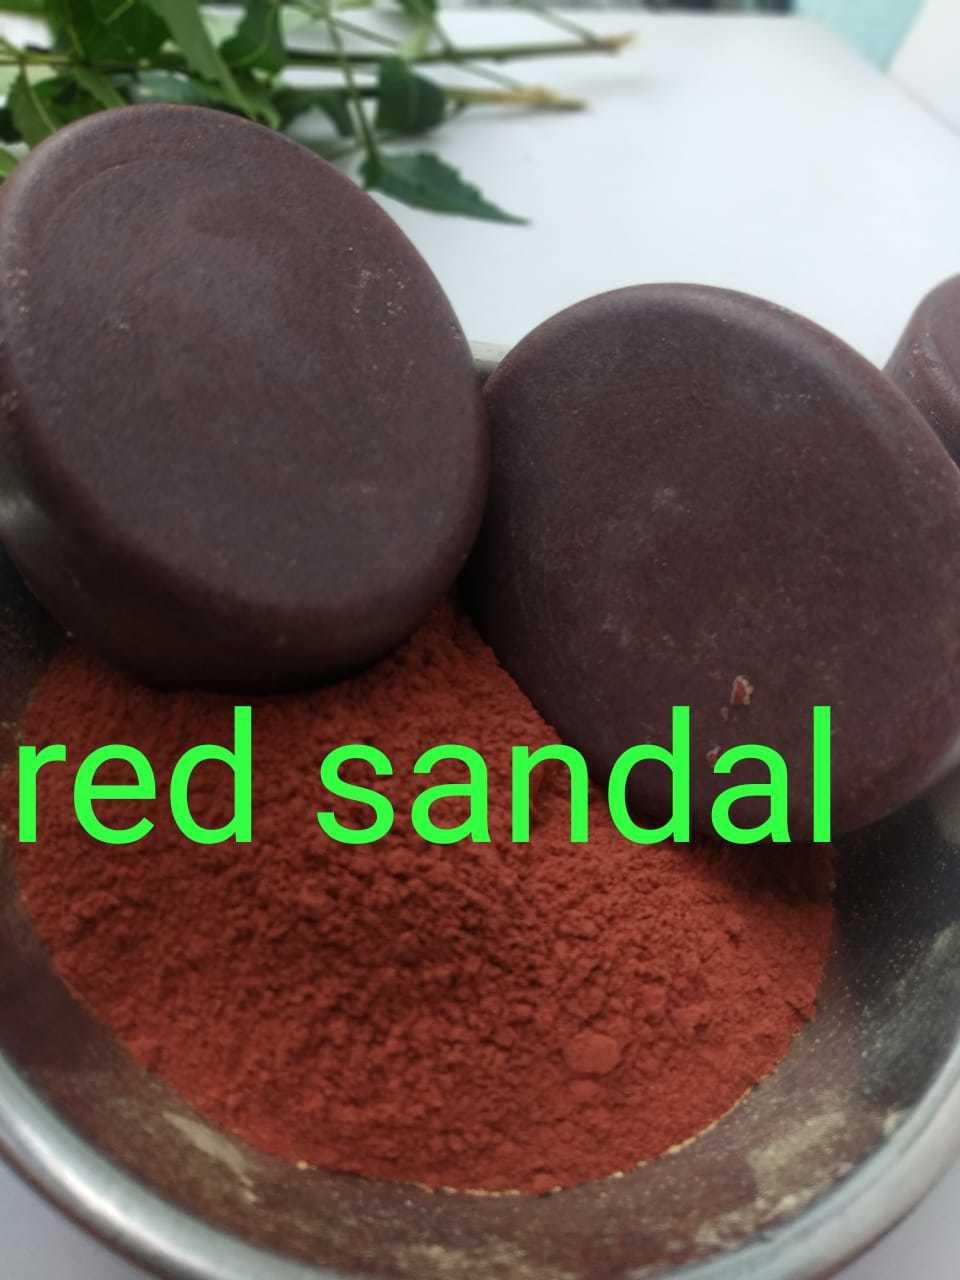 Red Sandal Herbal Soap